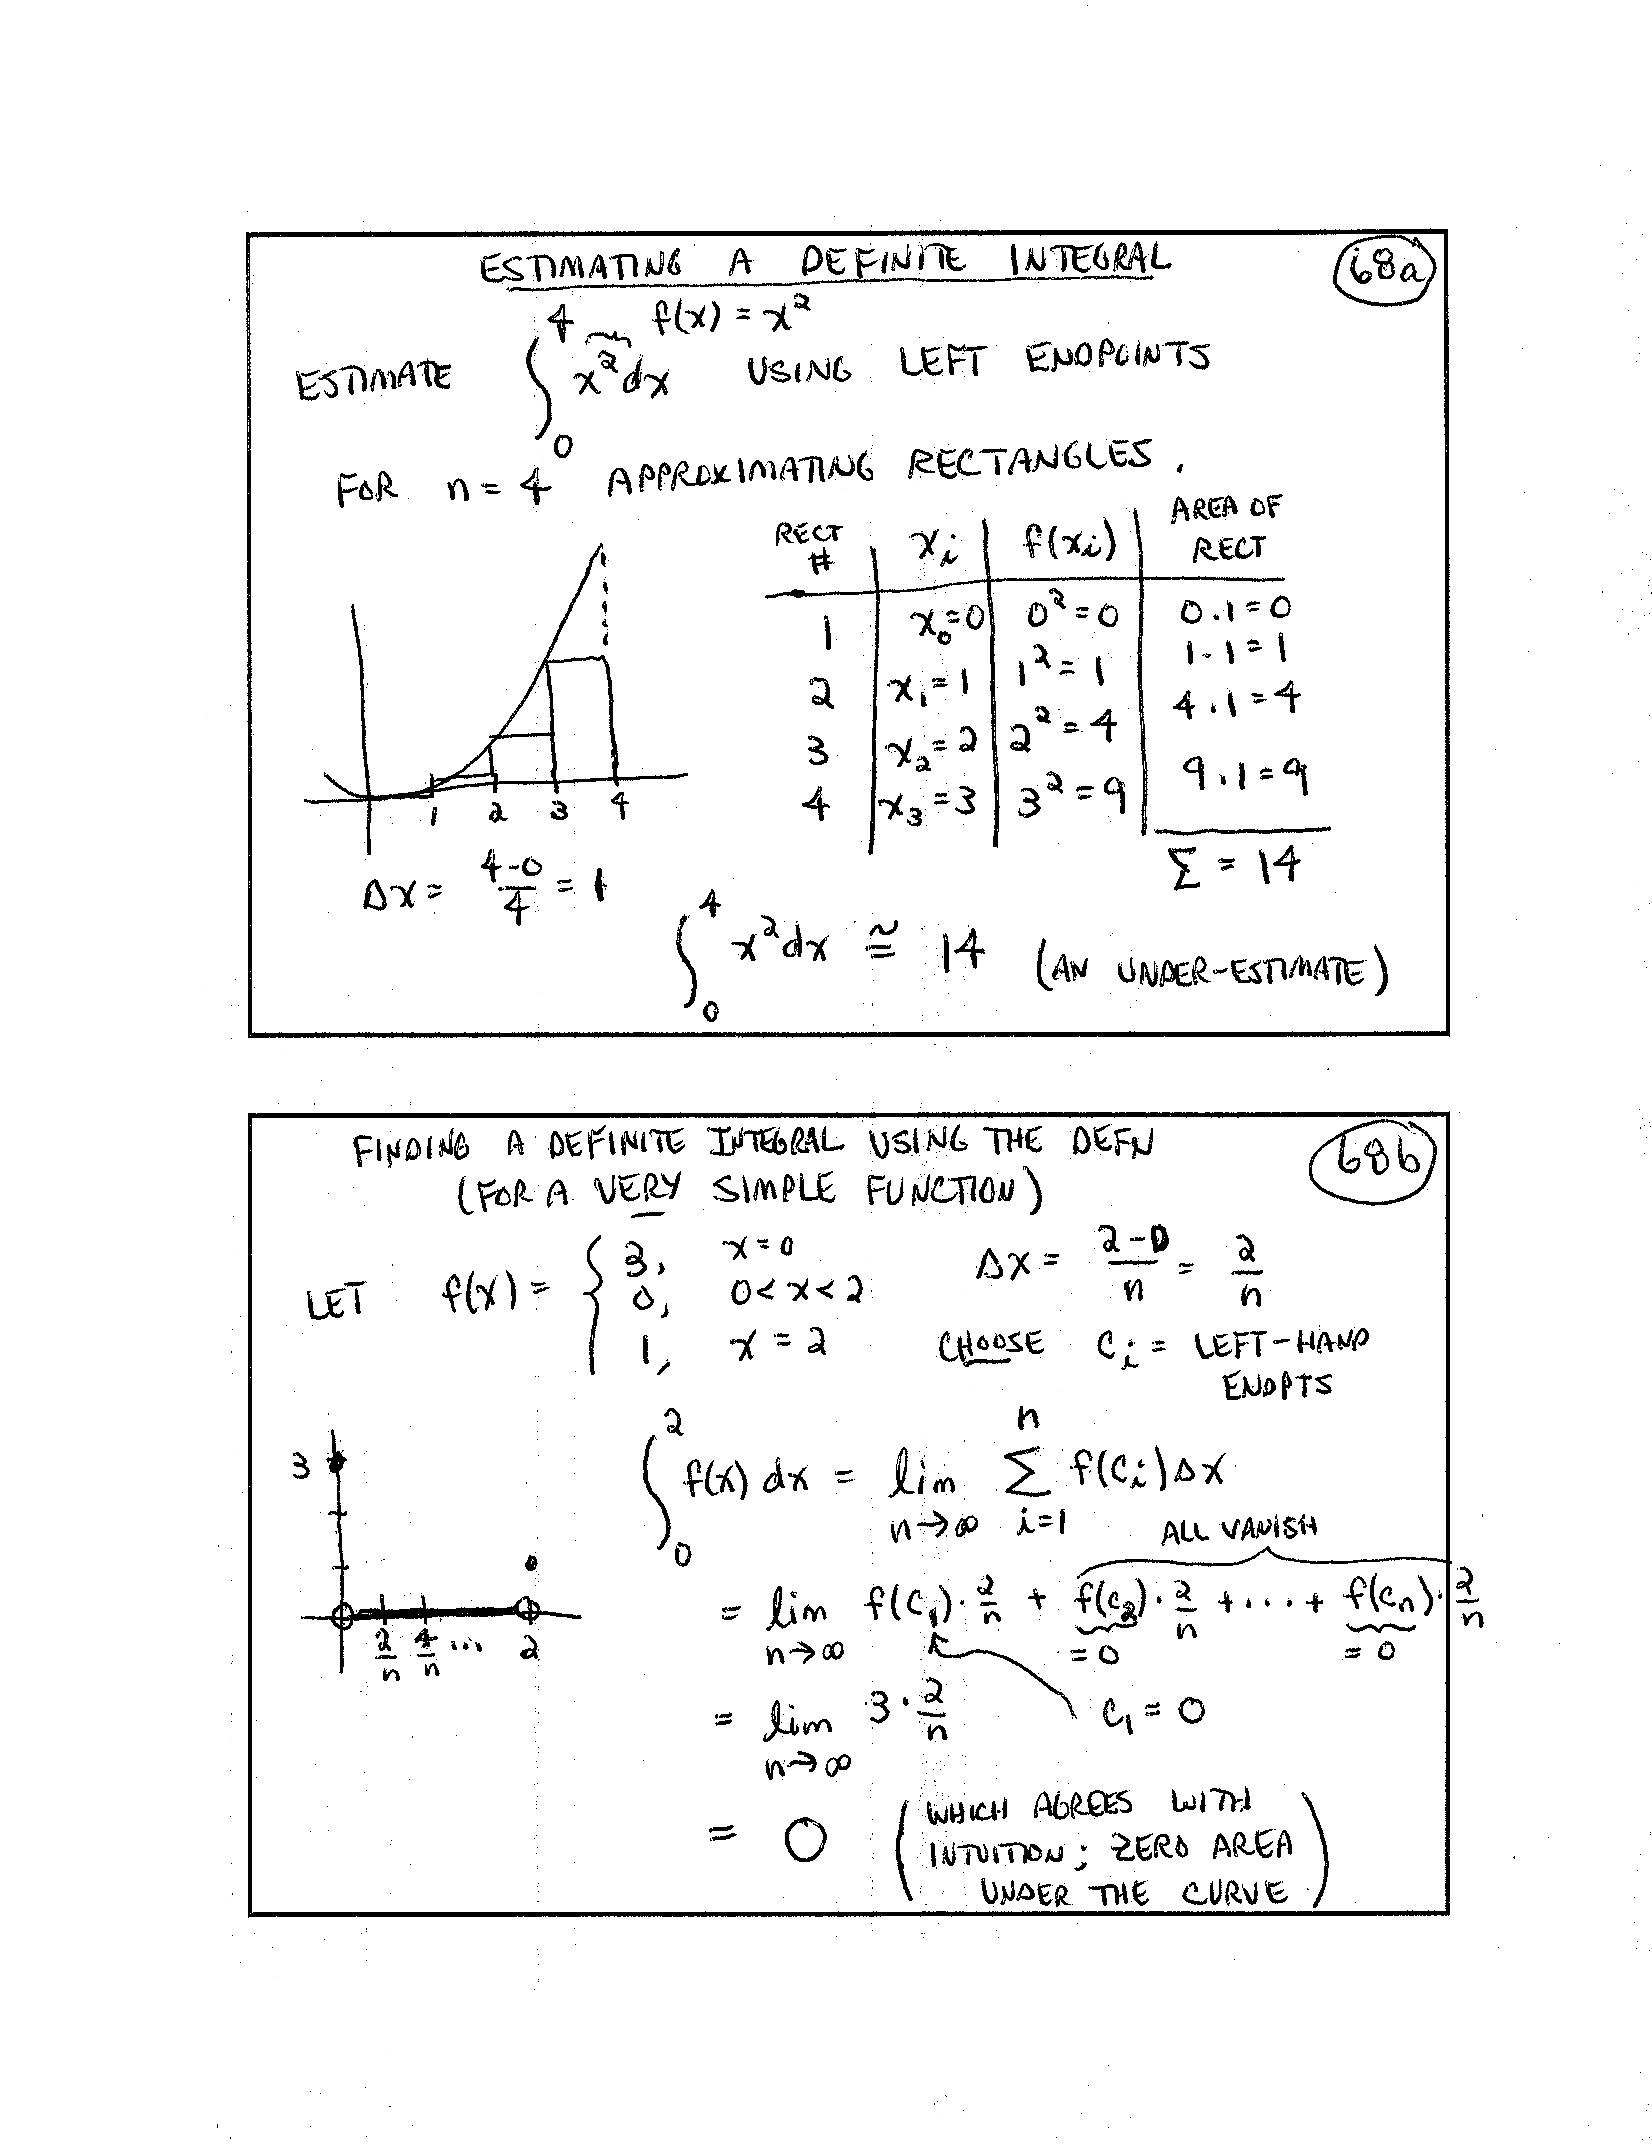 worksheet Riemann Sum Worksheet calculus i mathematics daily syllabus estimating a definite integral using riemann sum finding very simple the definition of integral